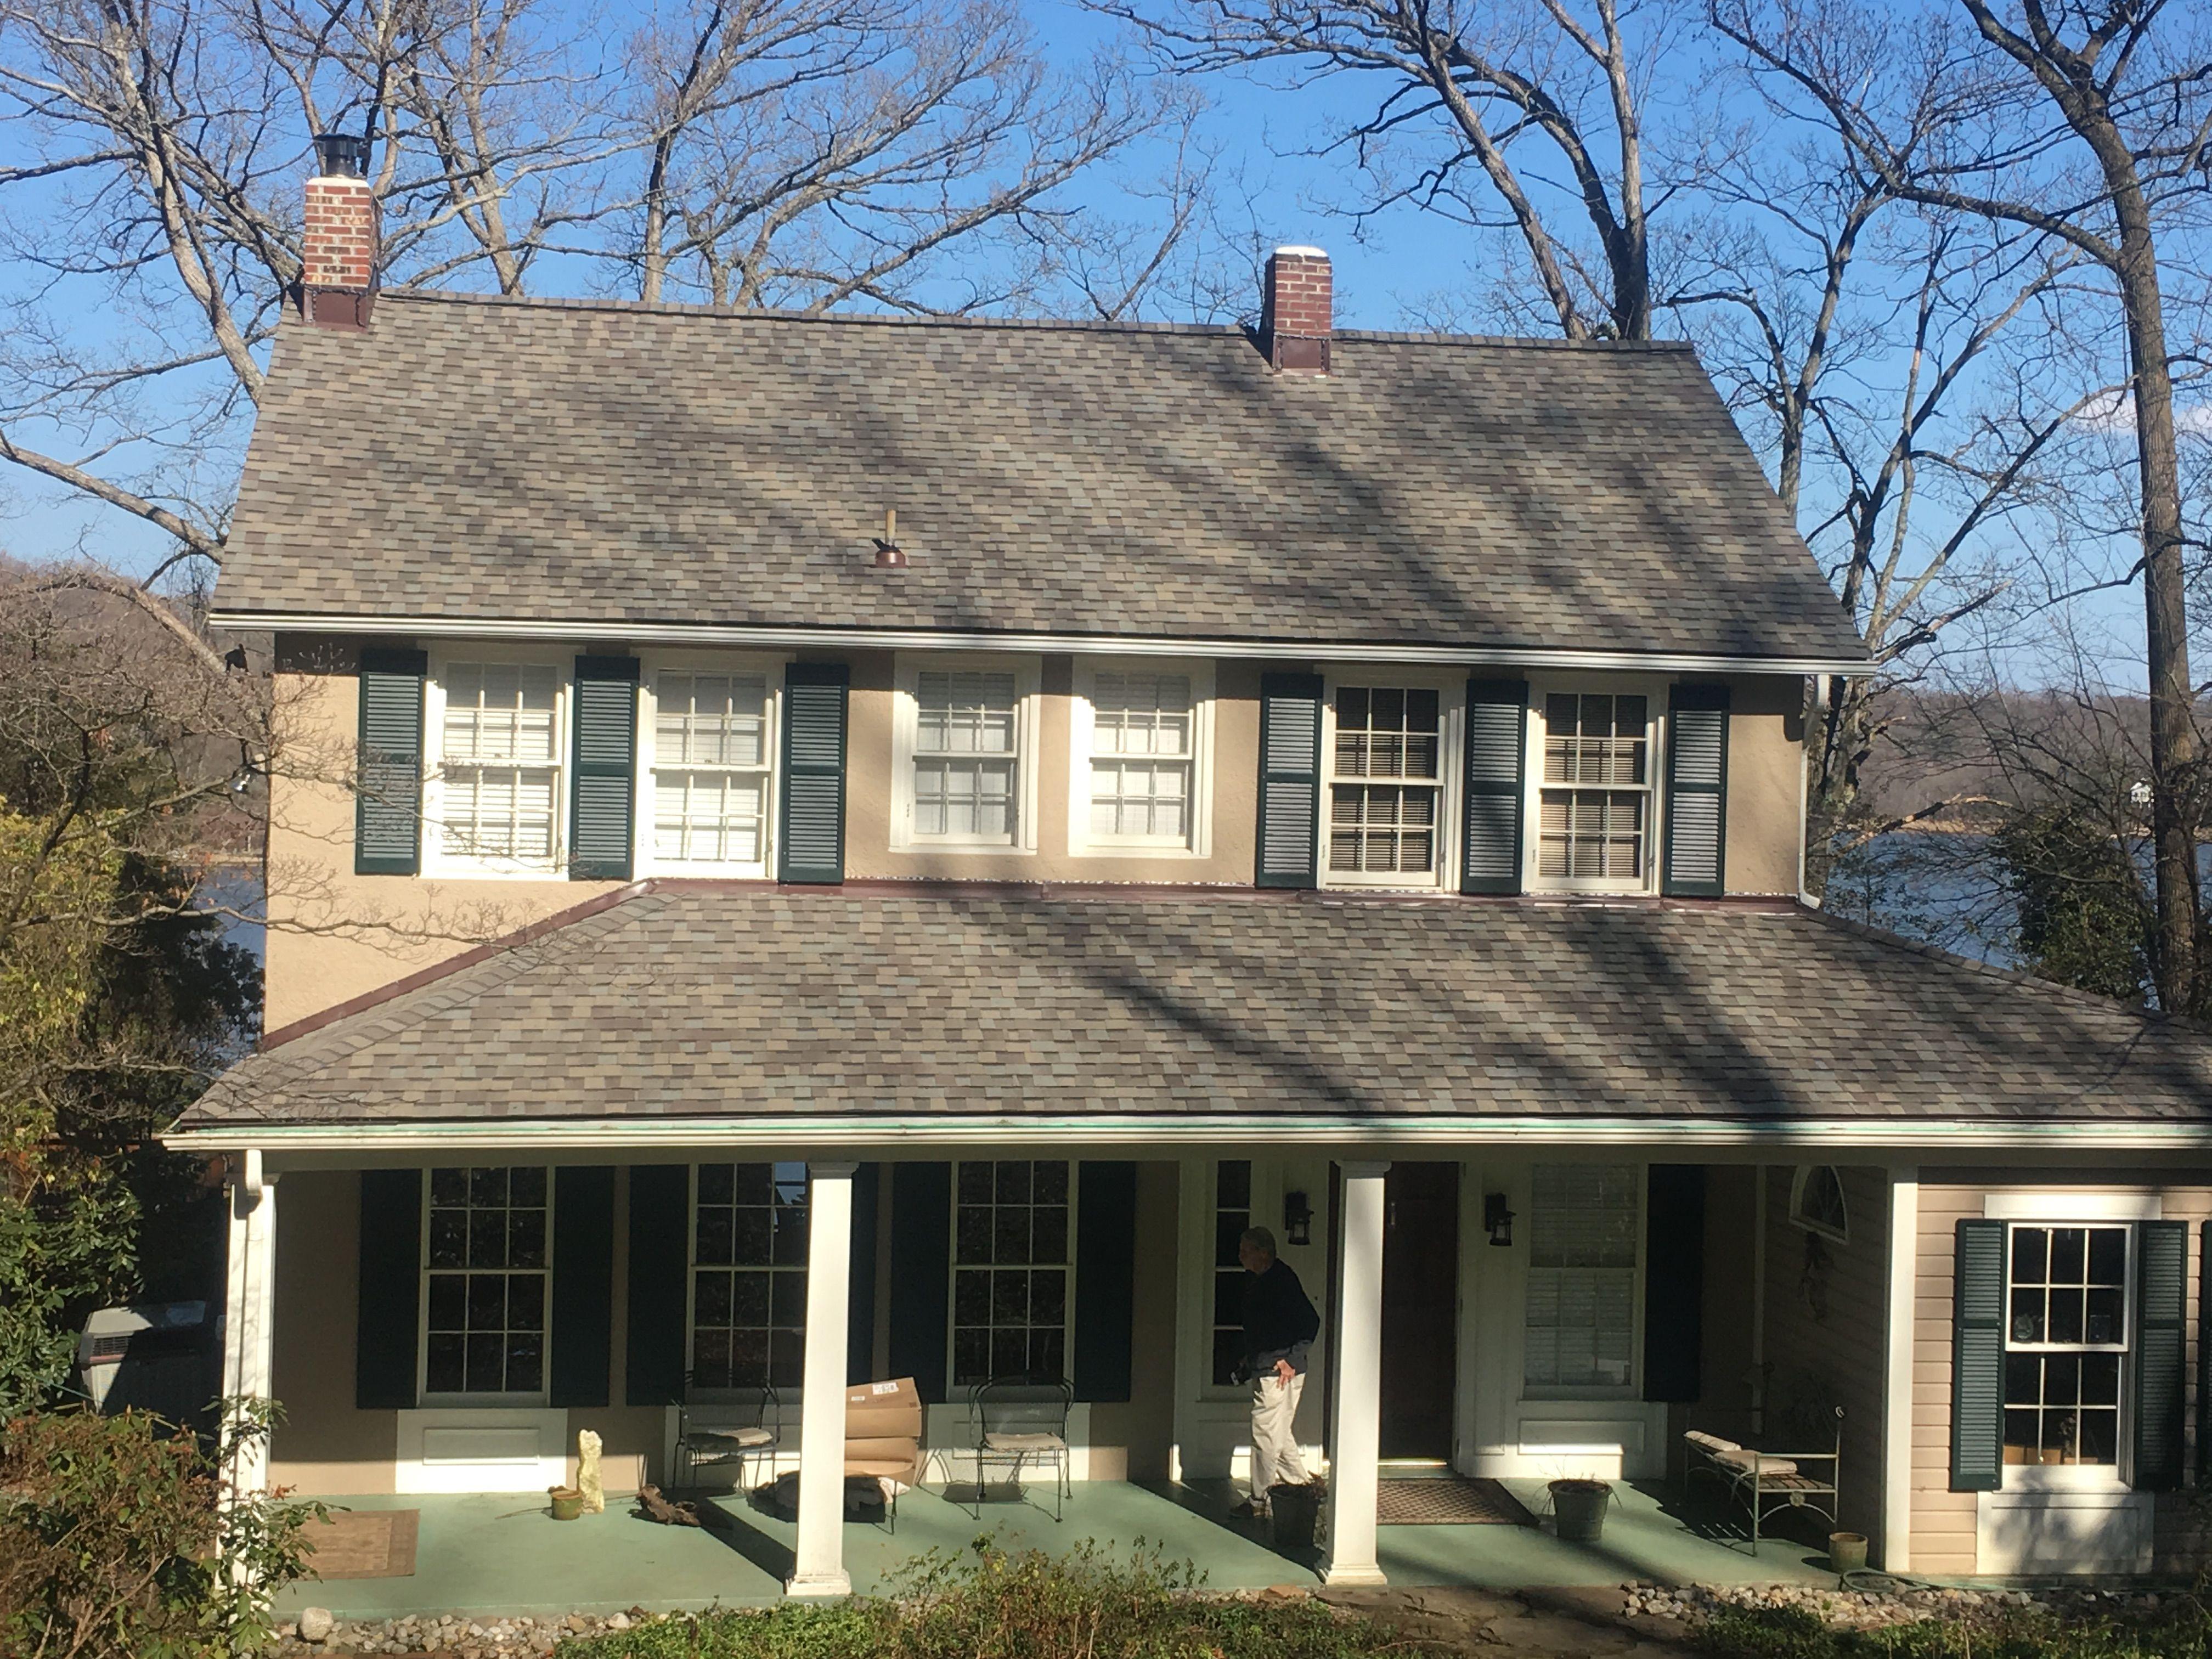 Best Landmark Pro Weathered Wood Shingles Wood Shingles Shingling Roof Repair 400 x 300